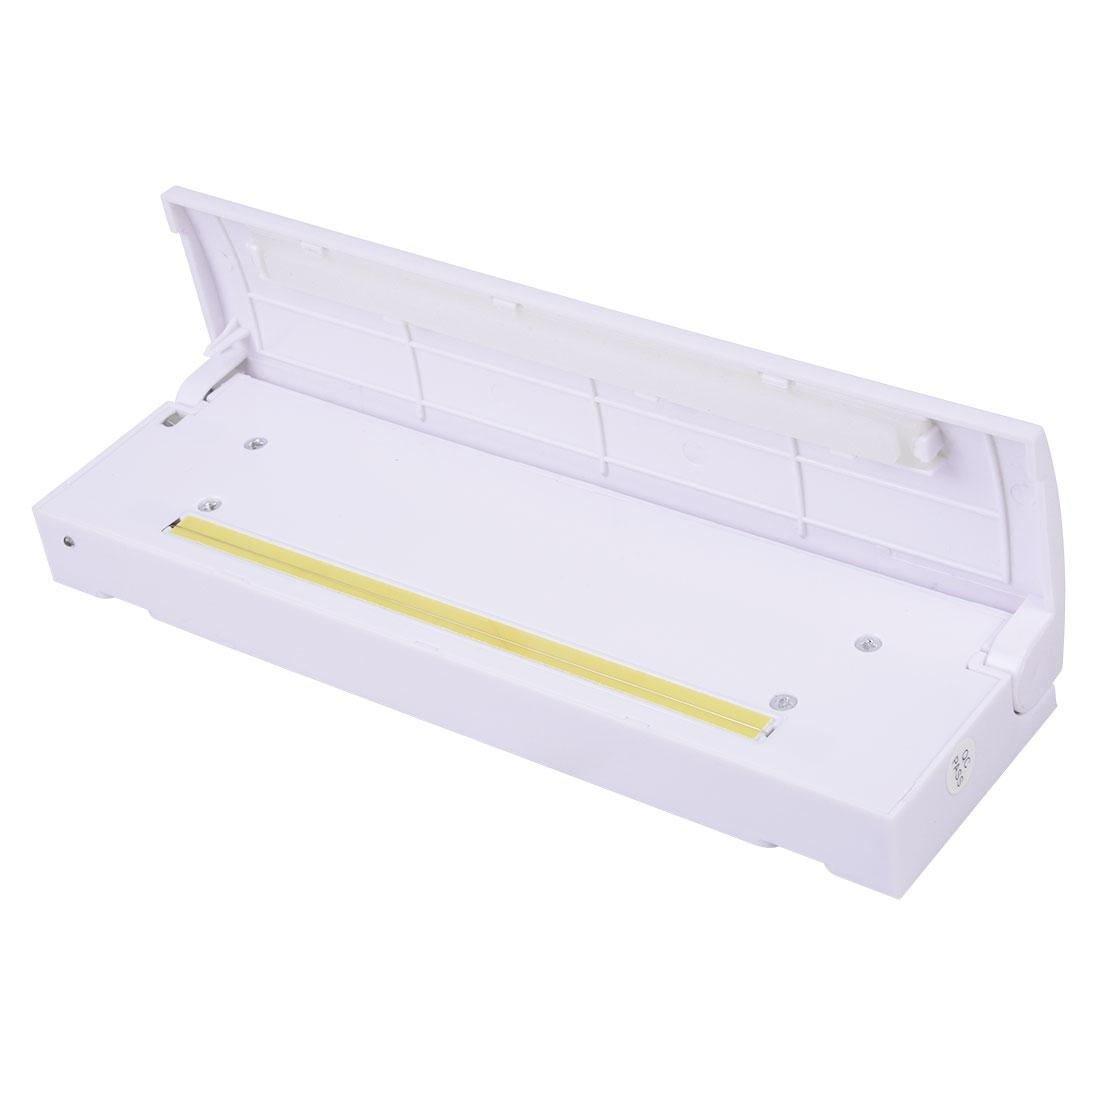 Heat Sealer Capper Plastic Bag Sealing Machine Snack Food Saver Storage Creates Airtight Containers